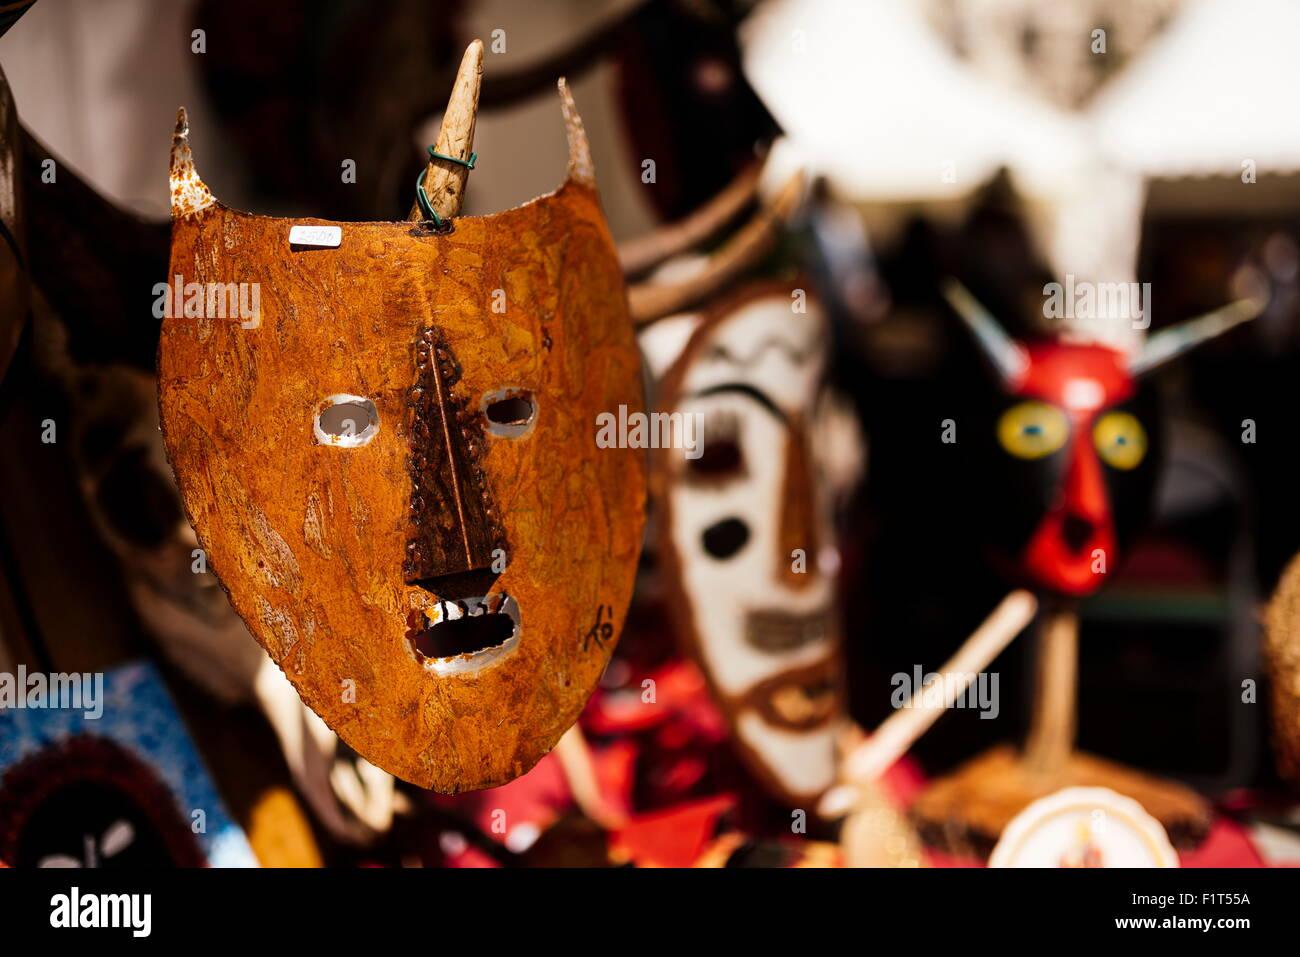 Traditionelle Maske Stall im Praça Rossio, Lissabon, Portugal, Europa Stockbild